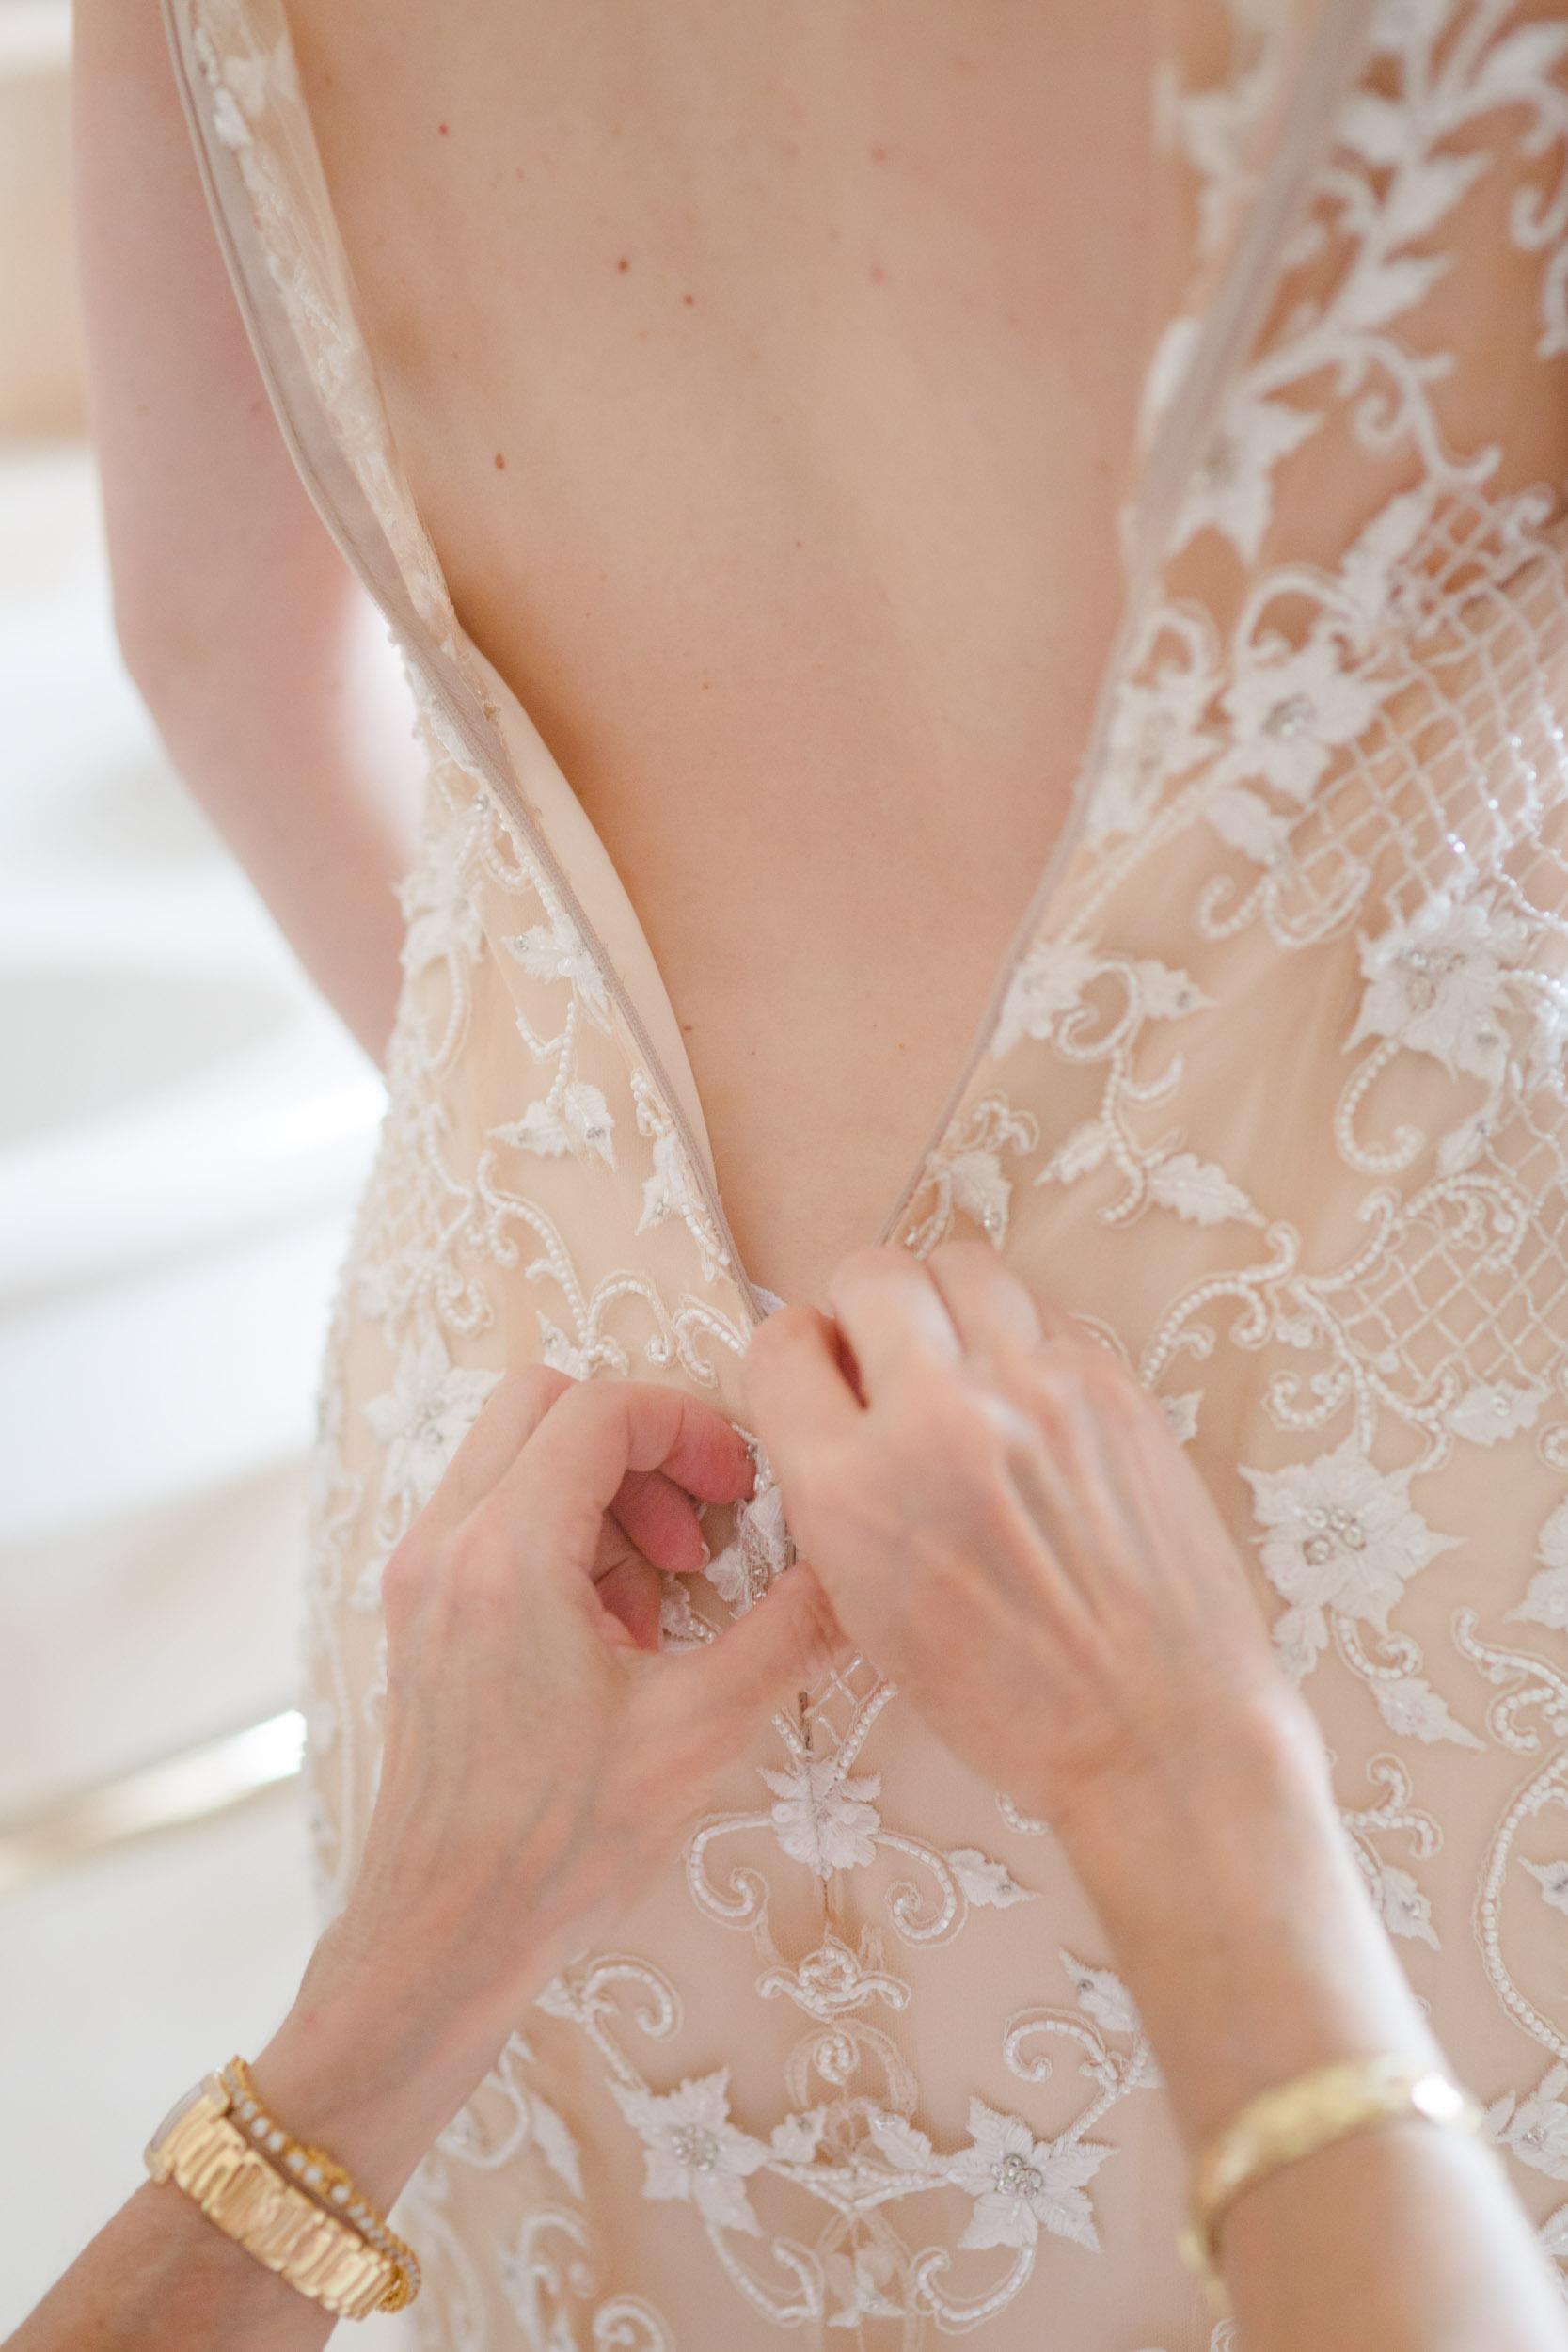 villa-gamberaia-florence-italy-destination-wedding-7.jpg